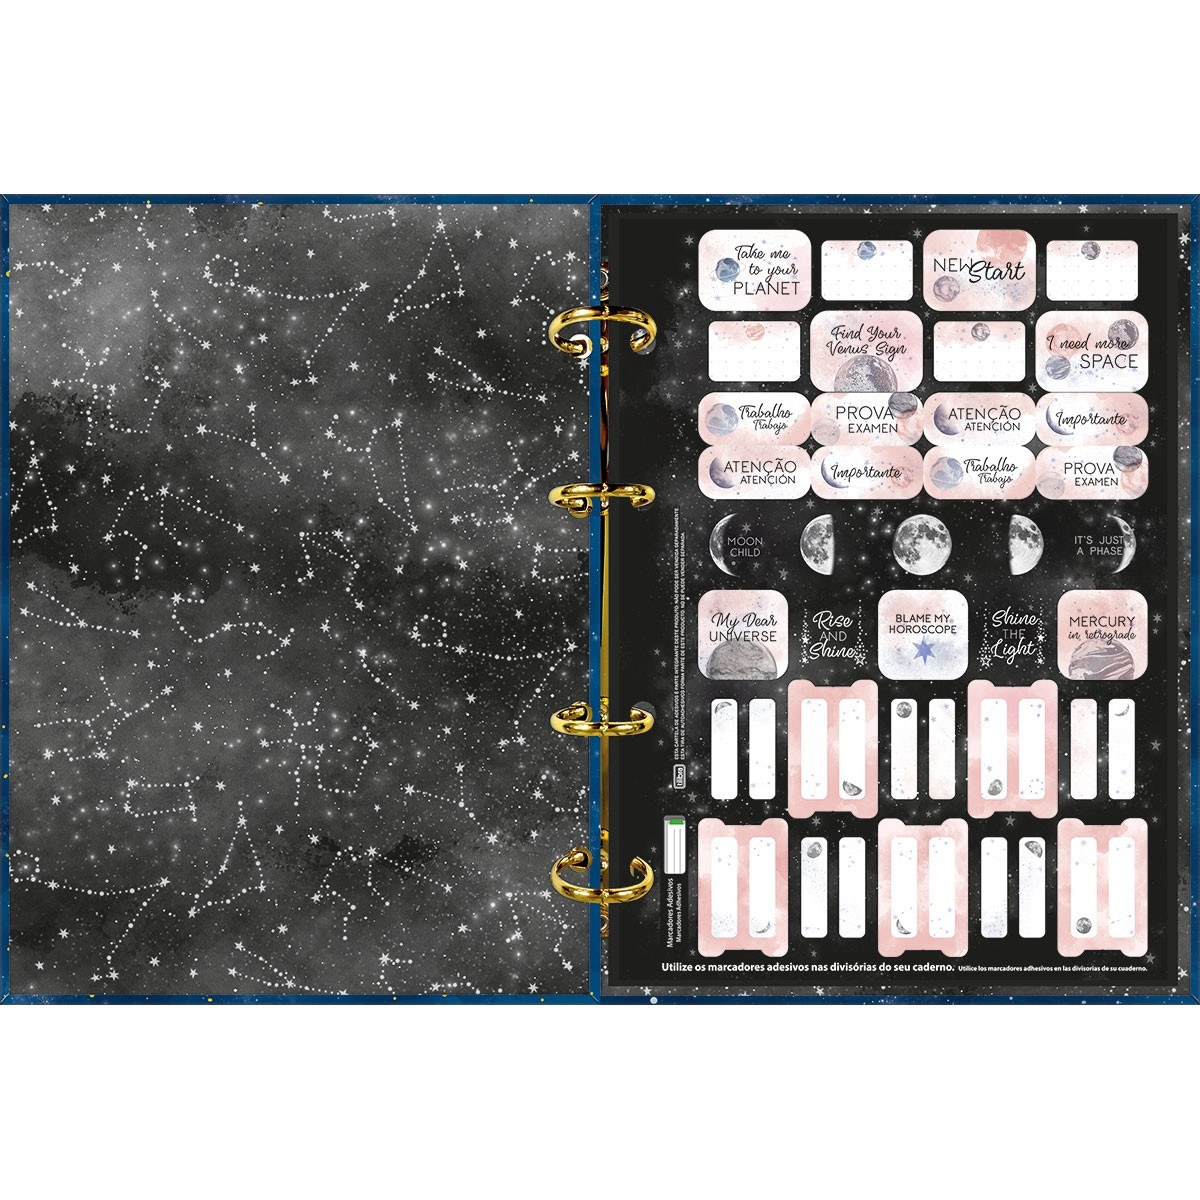 Caderno Argolado Cartonado Colegial Magic 160 Folhas - Tilibra